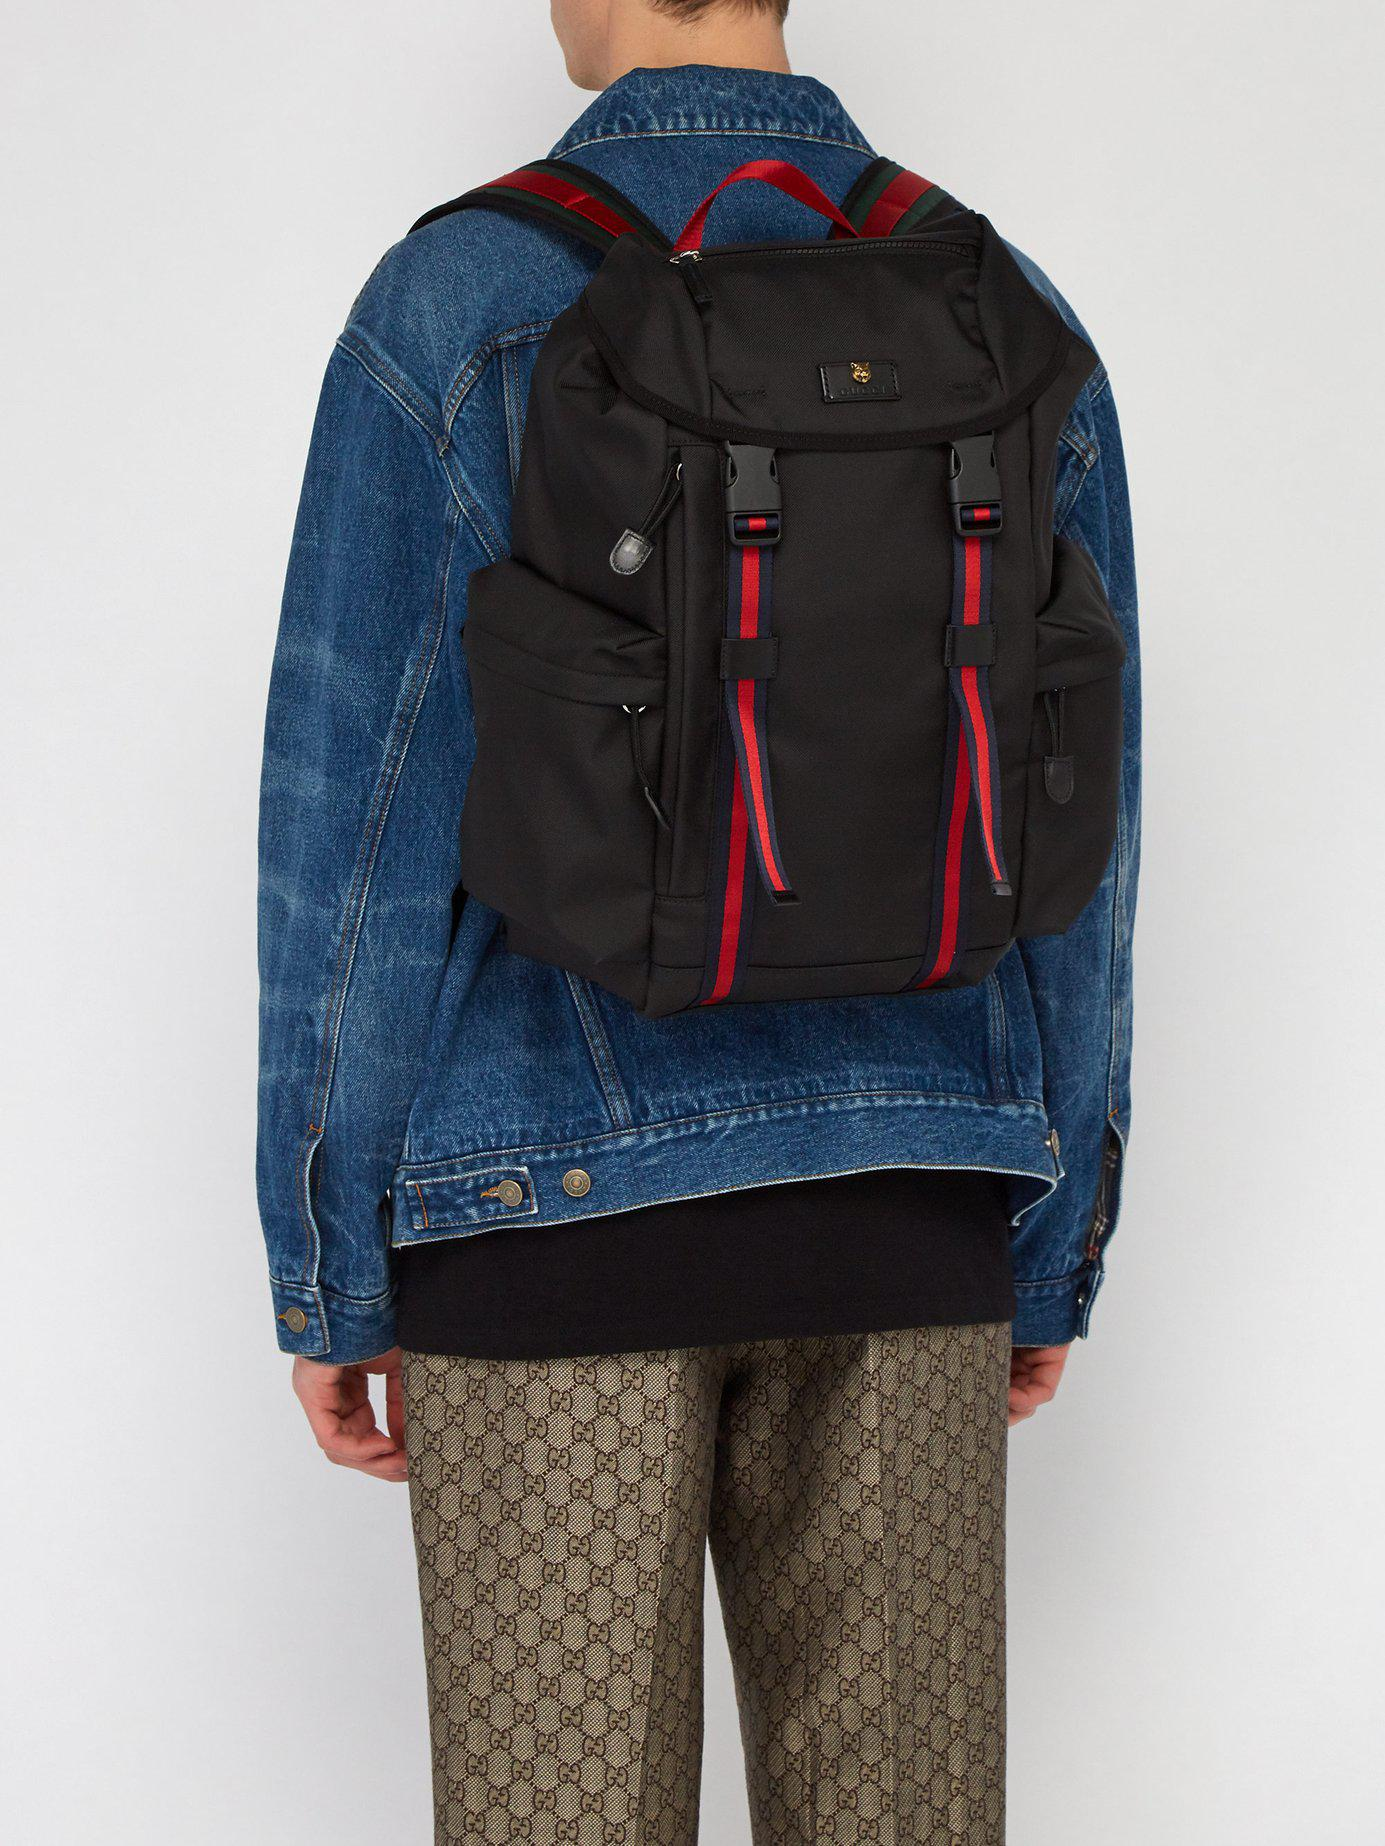 8e6dd21a319c Gucci Techno Web Stripe Canvas Backpack in Black for Men - Lyst